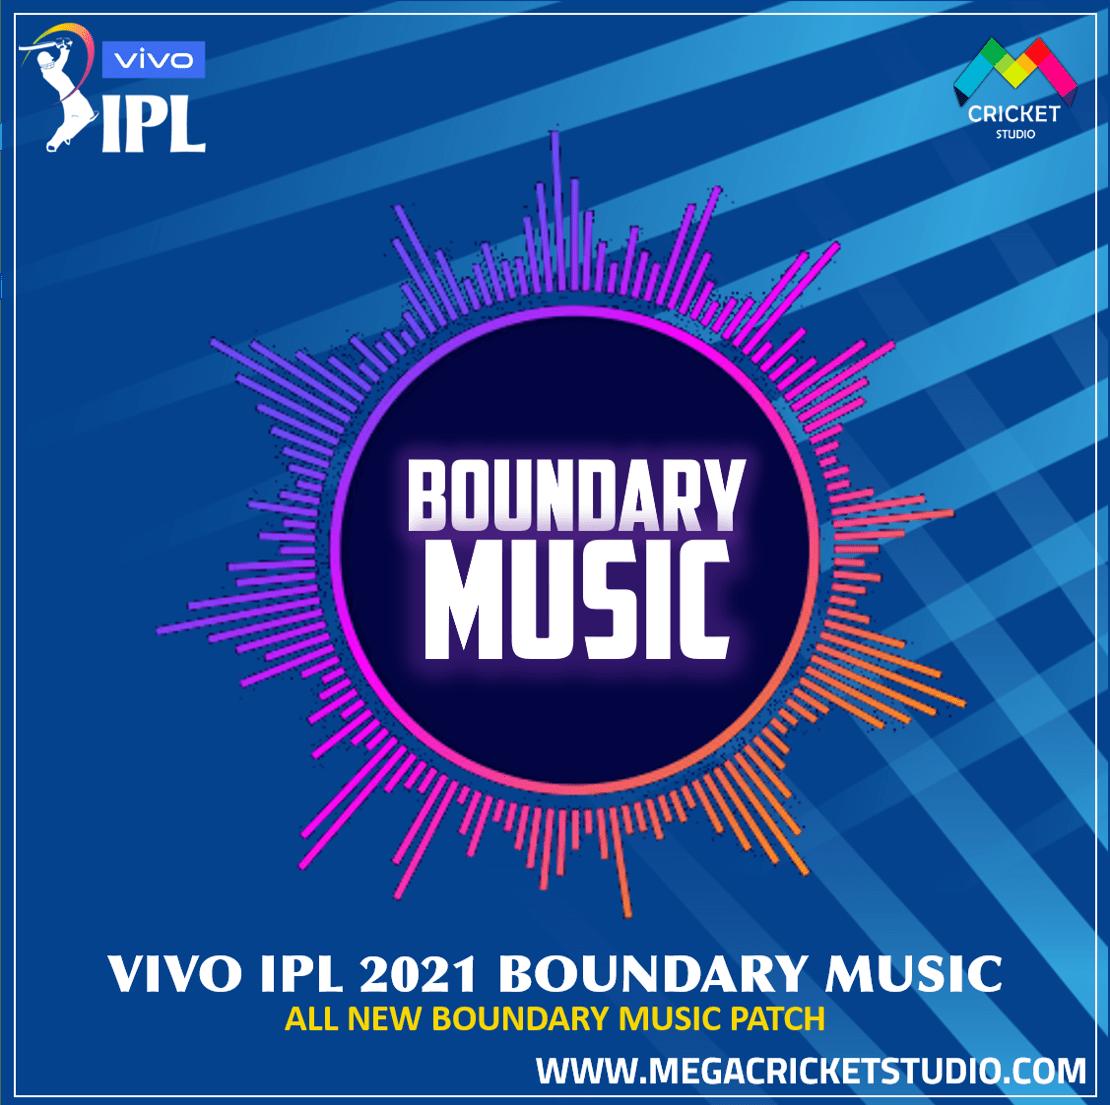 VIVO IPL 2021 Boundary Music Patch ea cricket 07